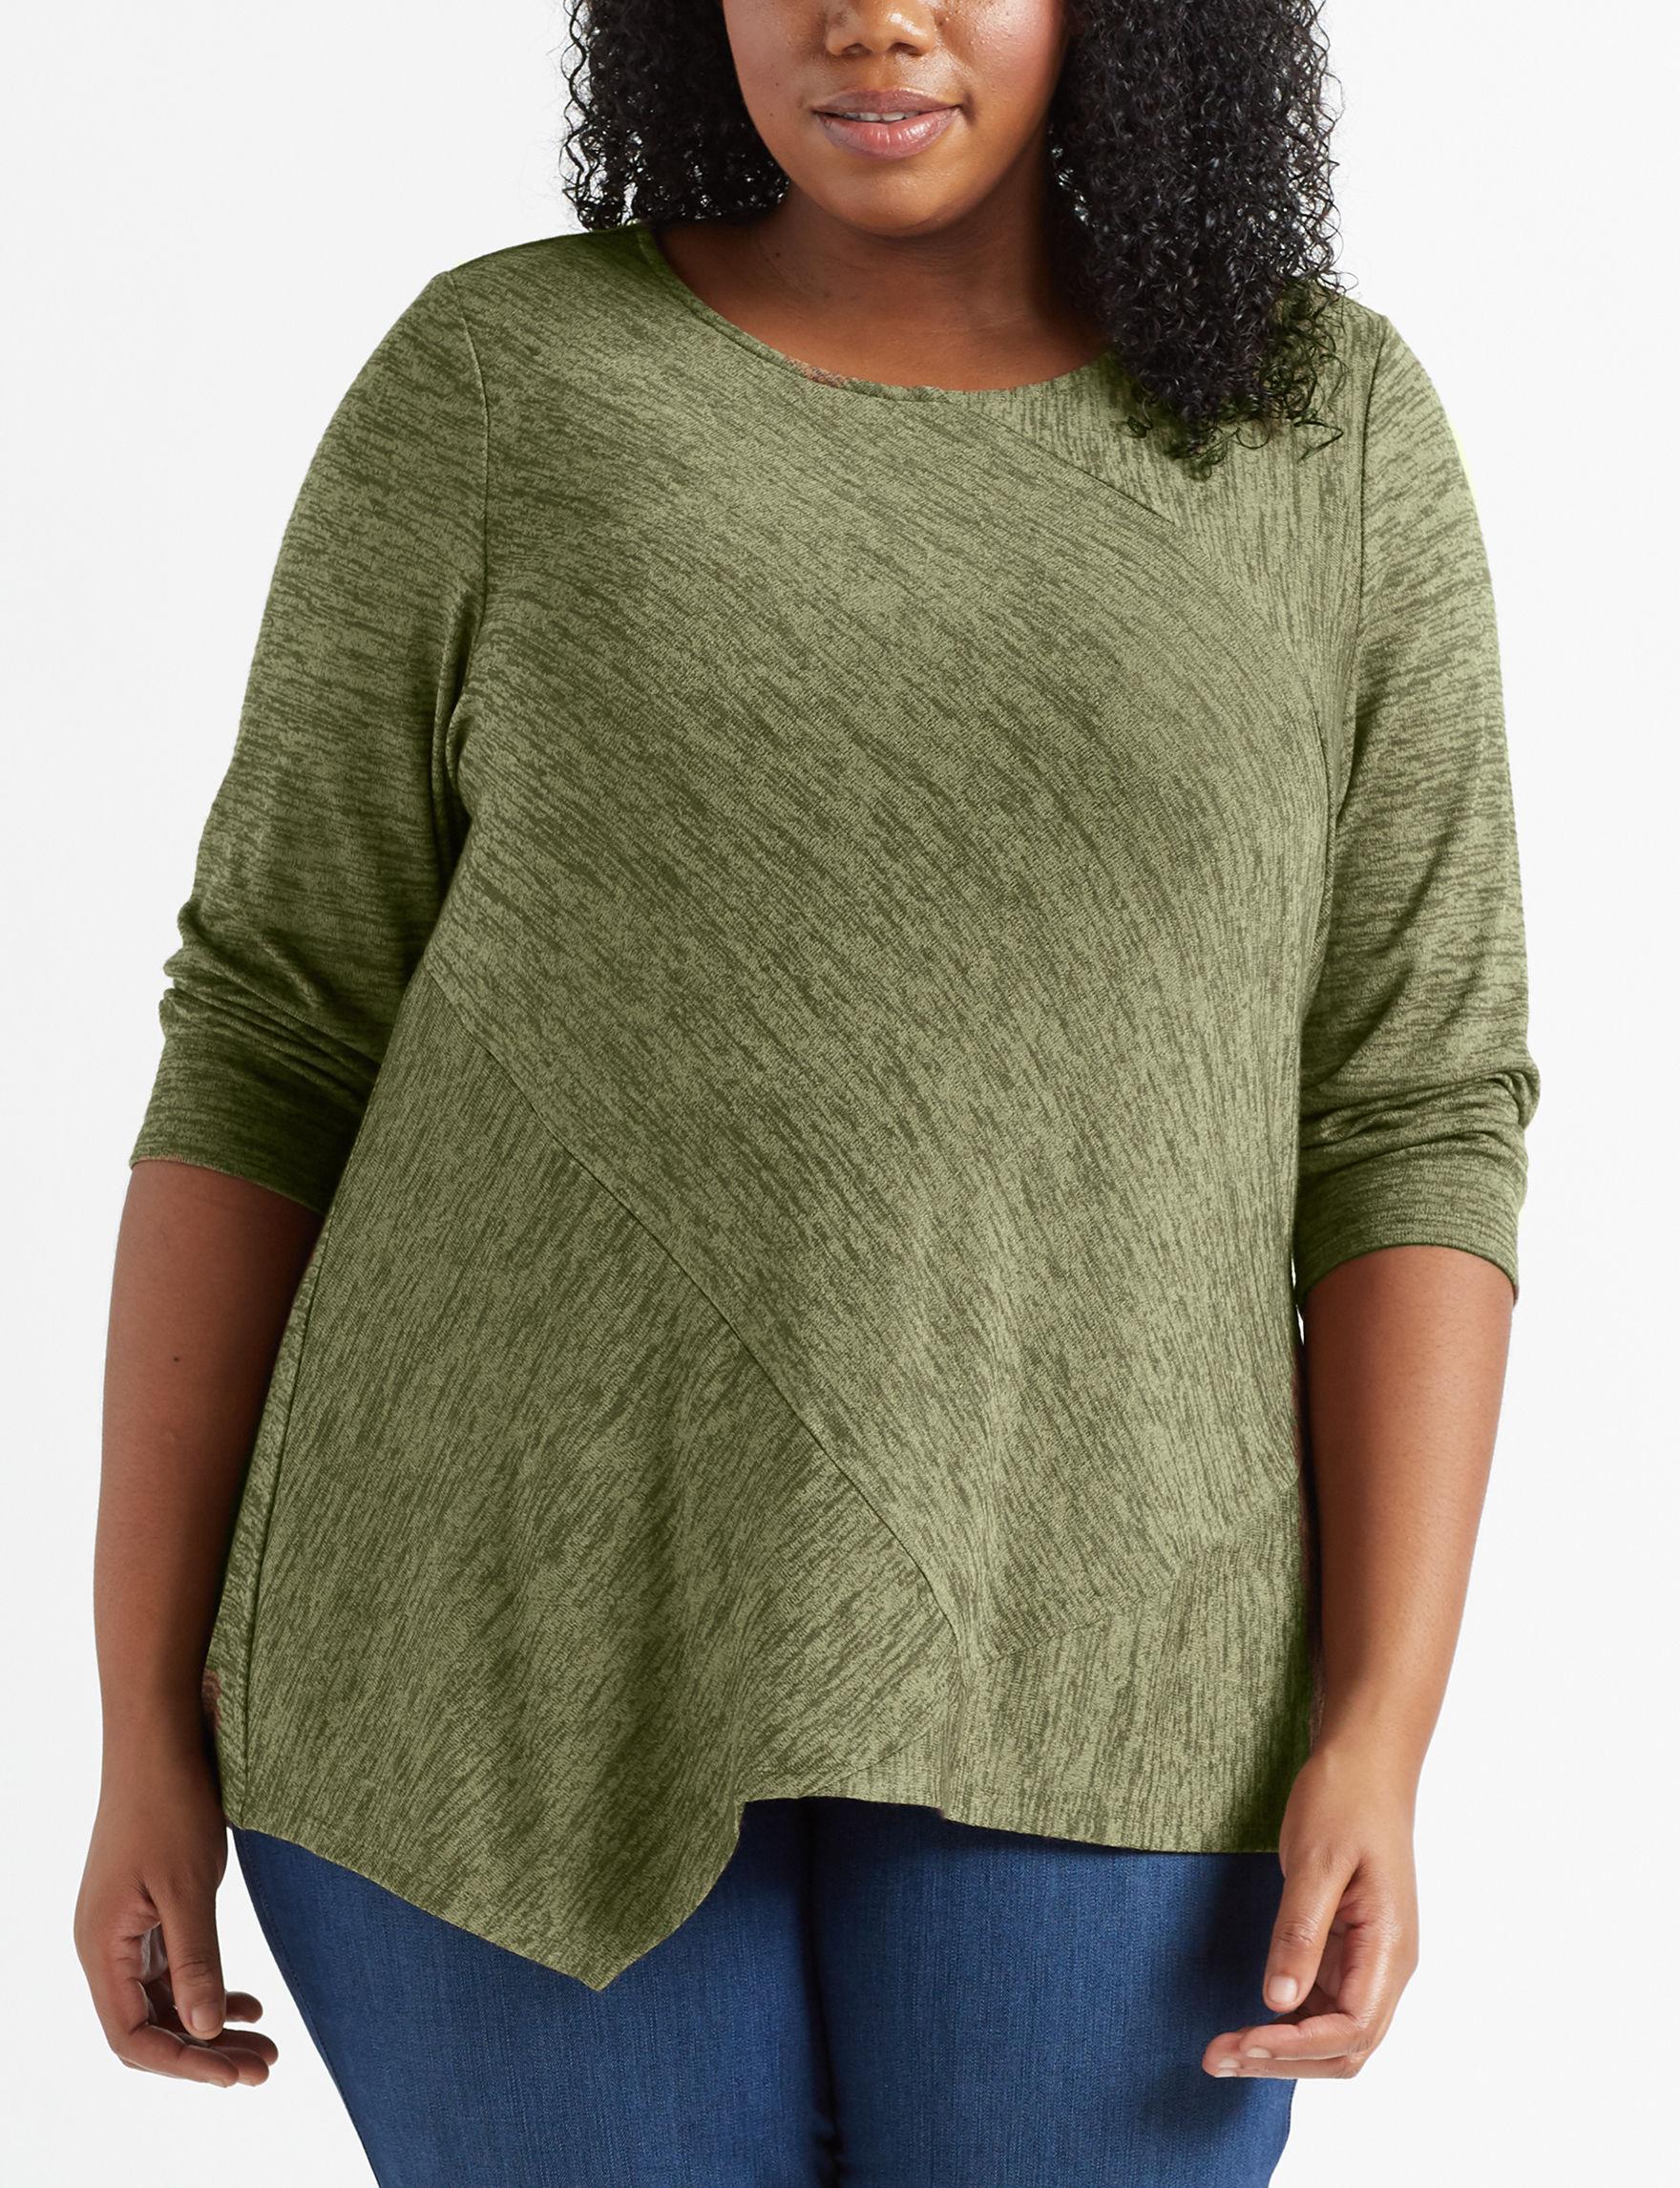 Zac & Rachel Brown Shirts & Blouses